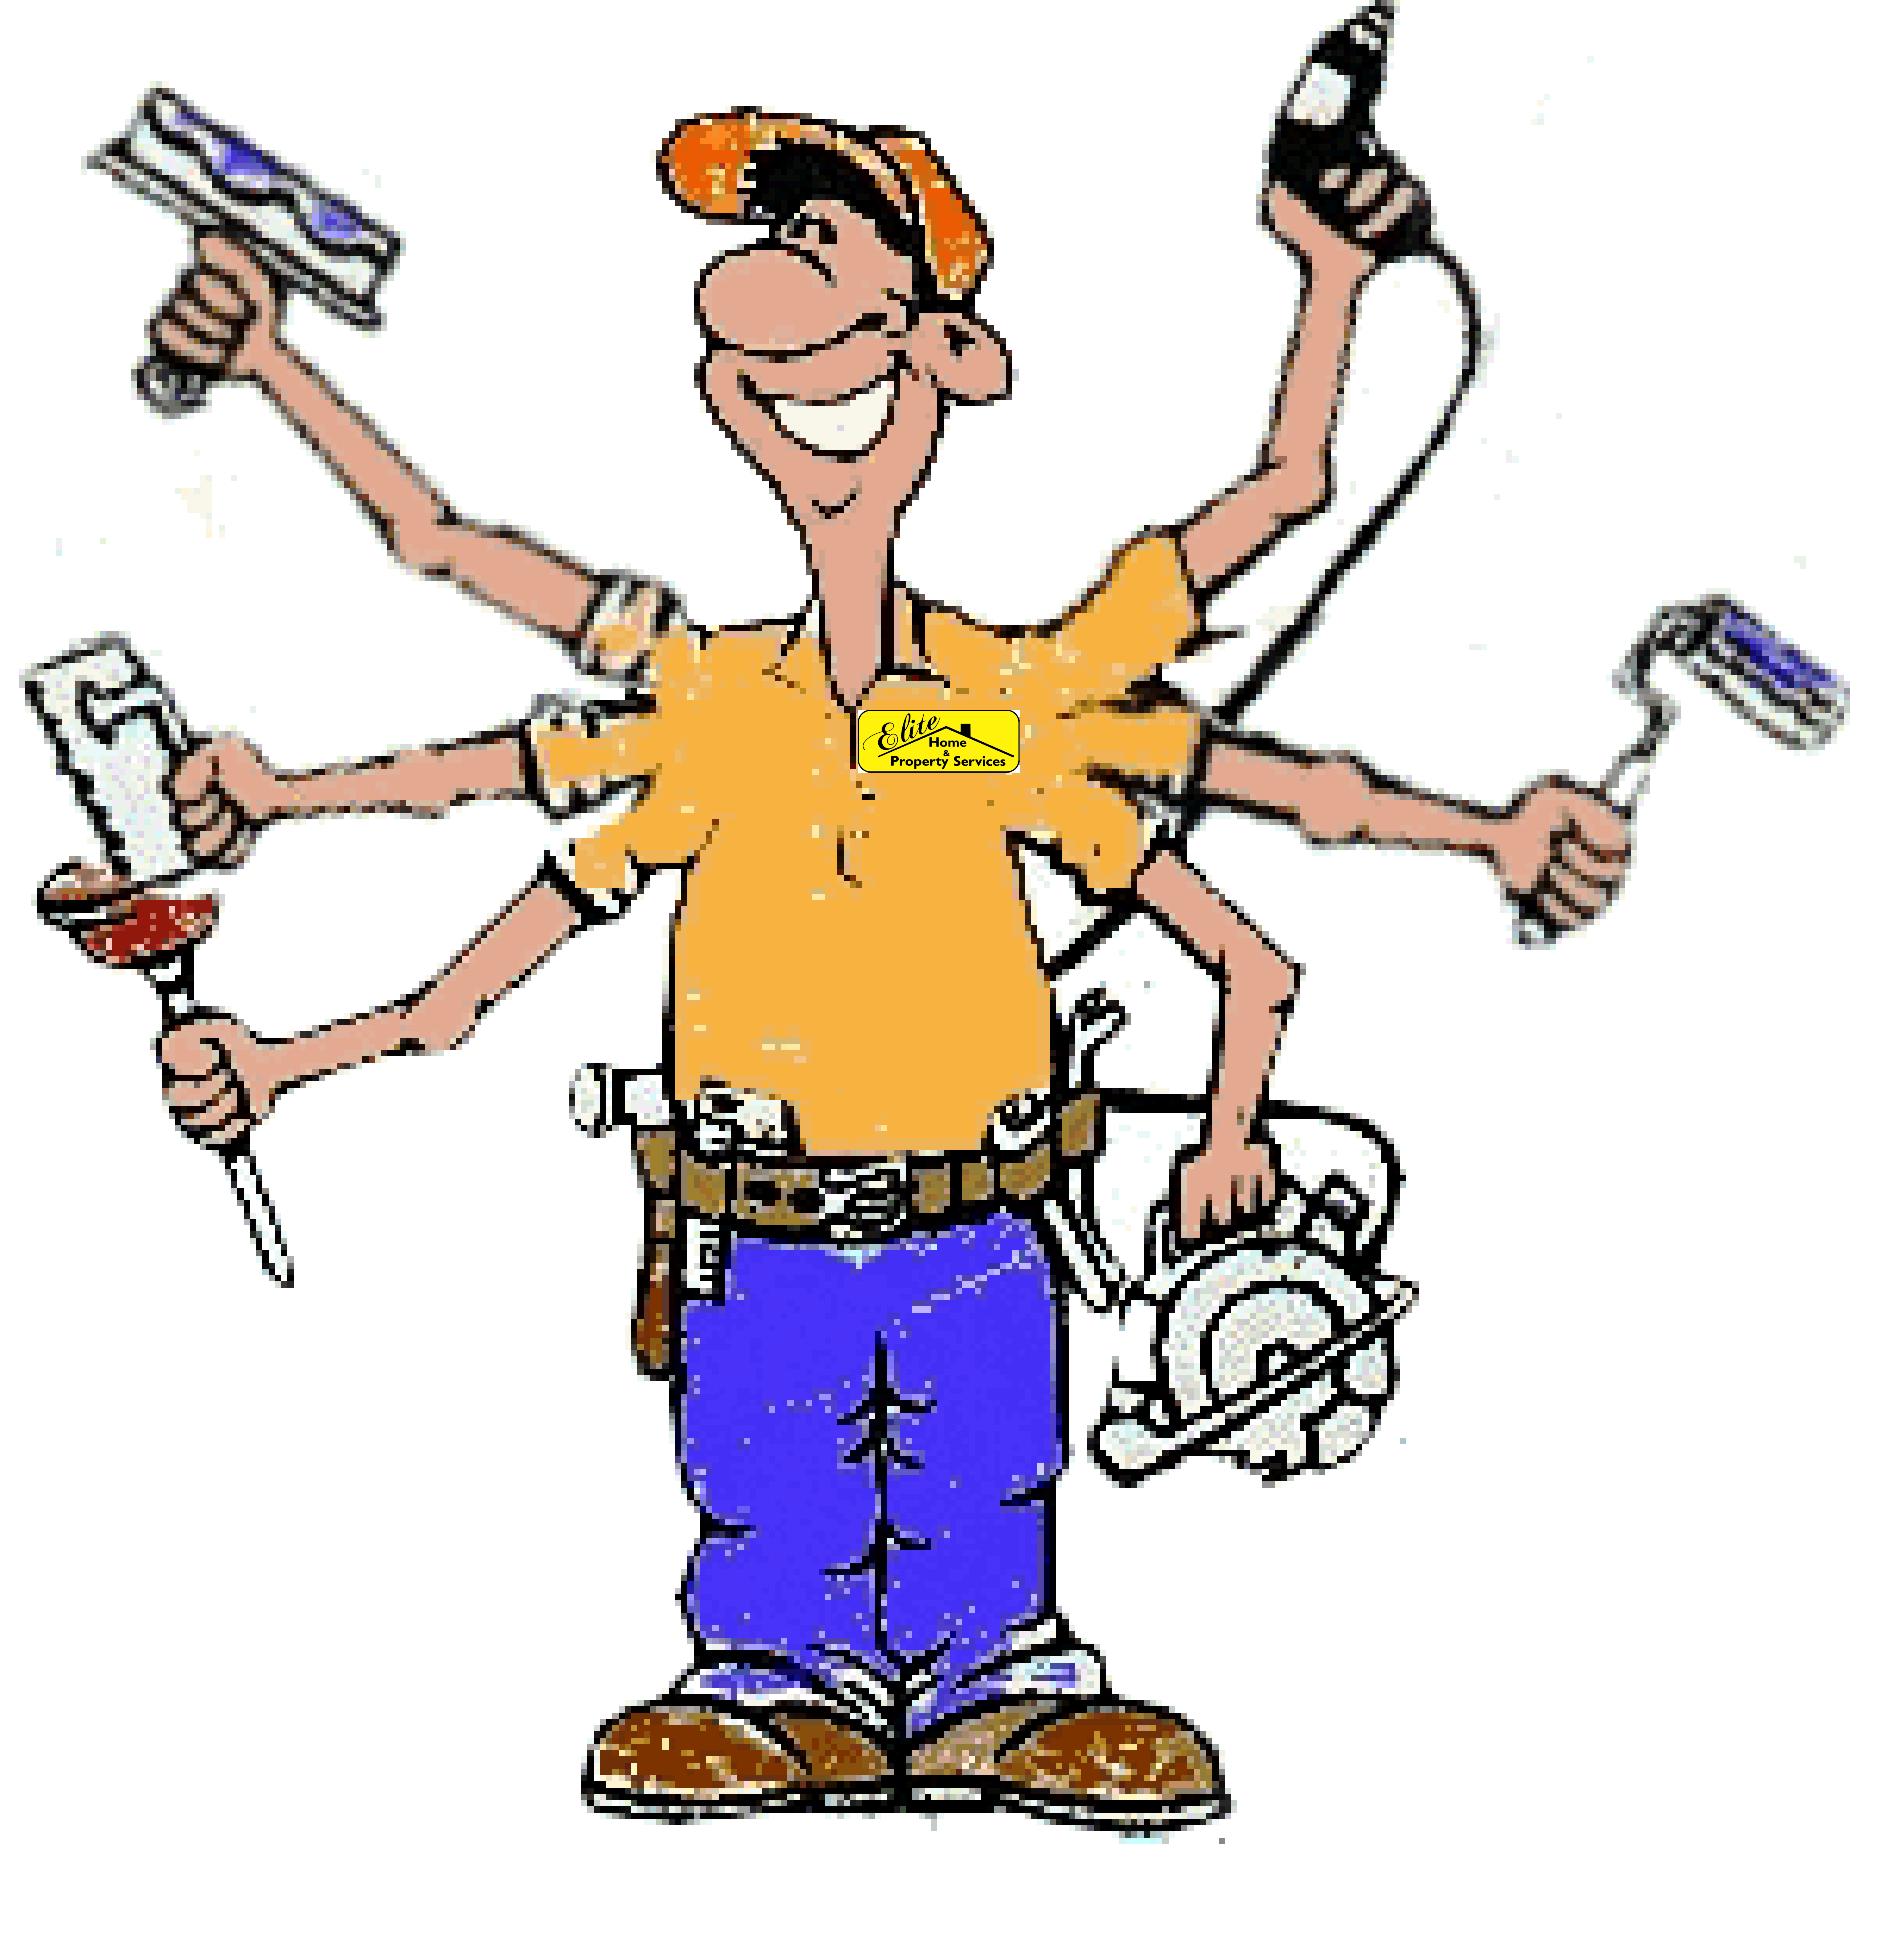 Building maintenance clipart freeuse stock Free Maintenance Cliparts, Download Free Clip Art, Free Clip Art on ... freeuse stock